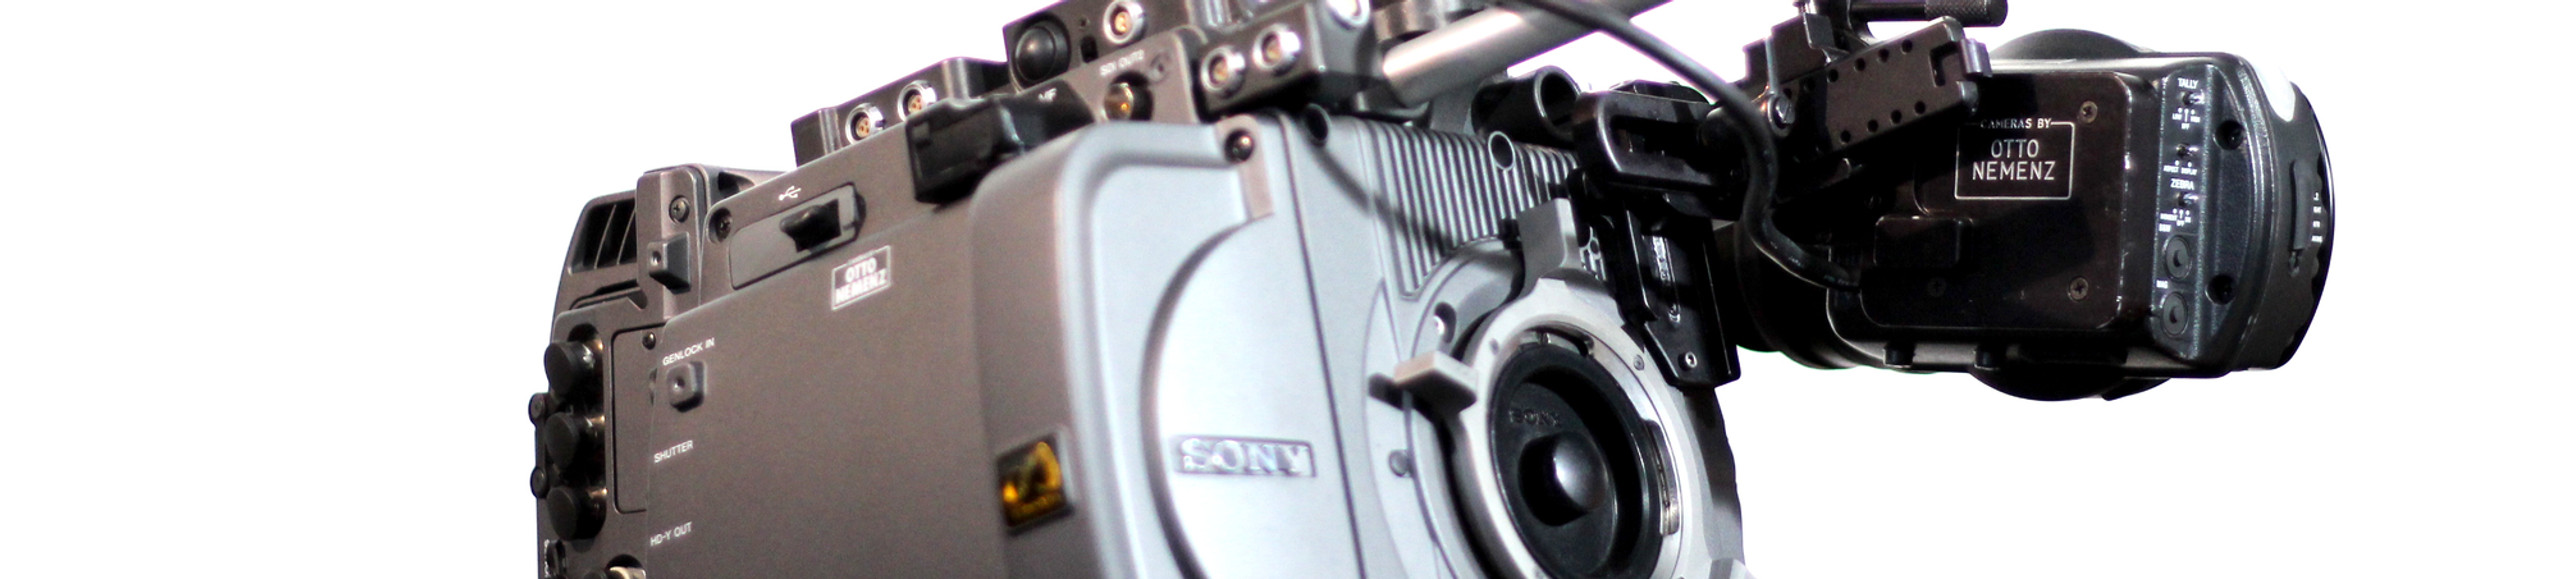 camera bearbeitet 2.jpg